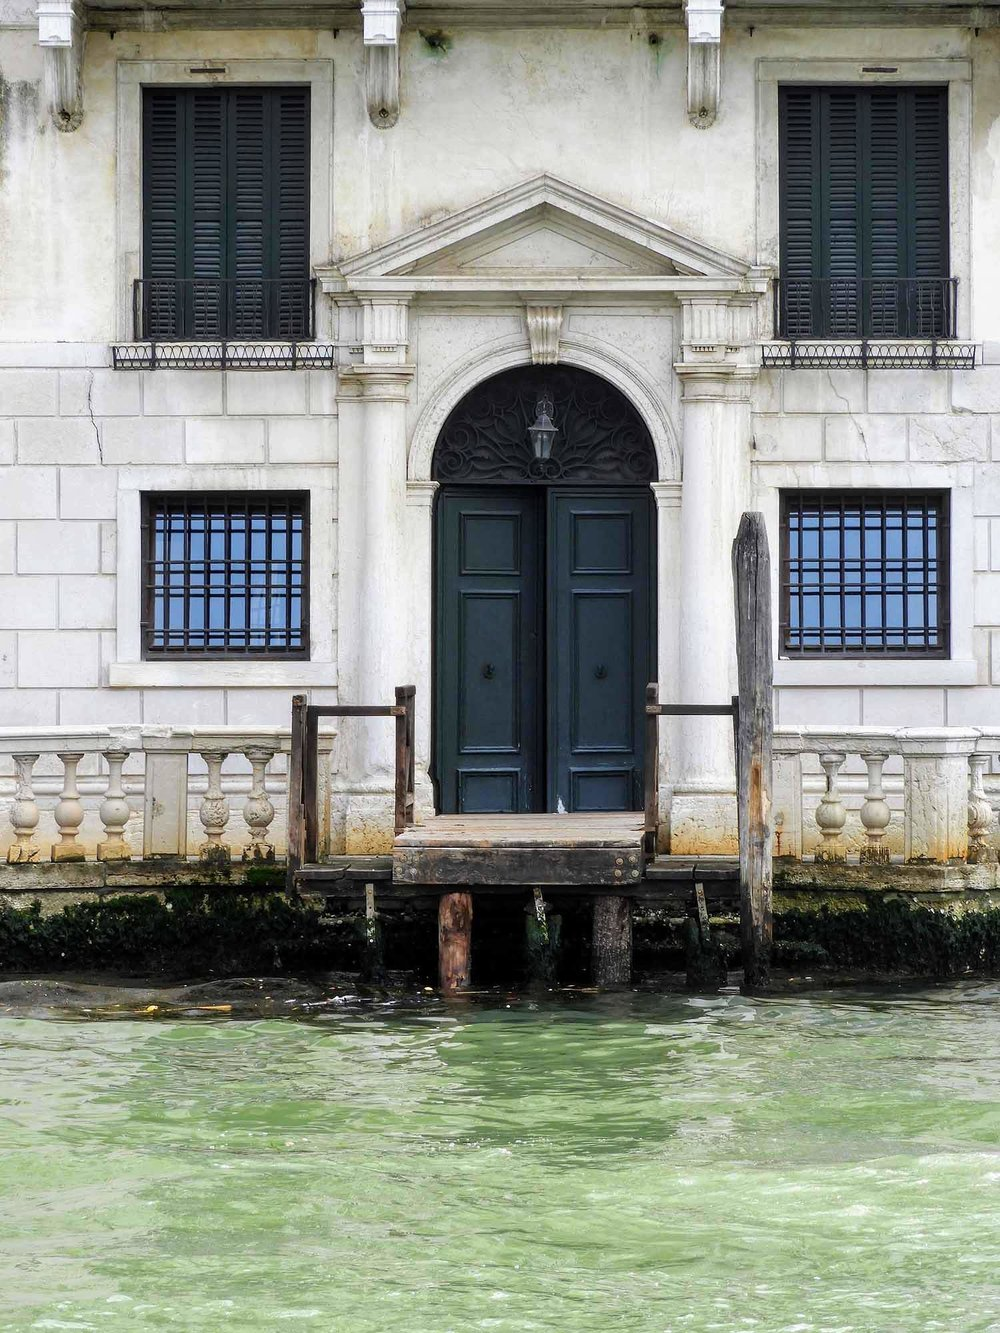 italy-italia-venice-water-door-entrance.jpg